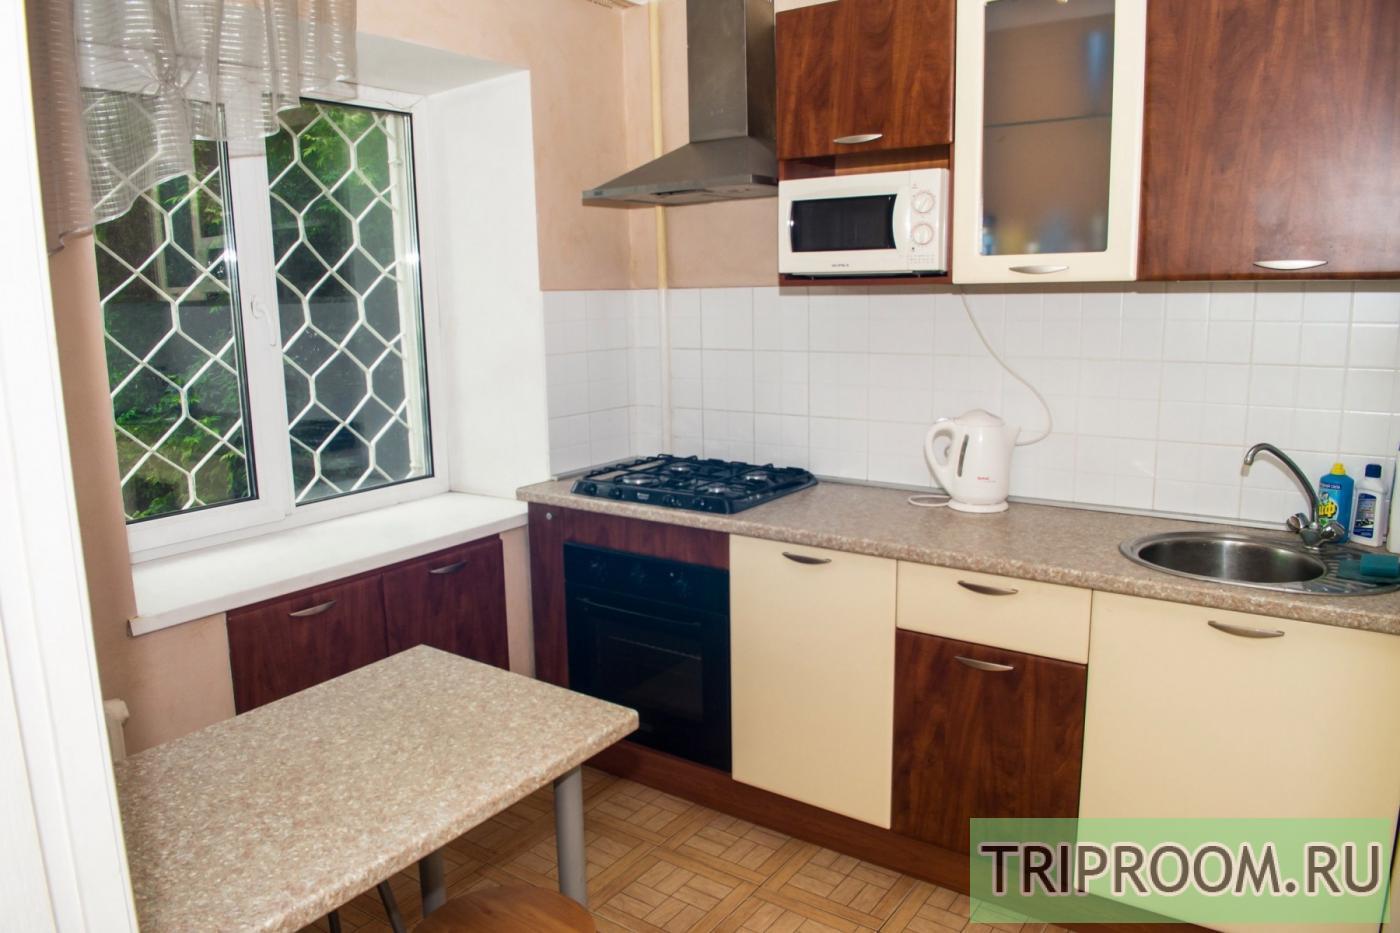 2-комнатная квартира посуточно (вариант № 20494), ул. Газеты звезда, фото № 8